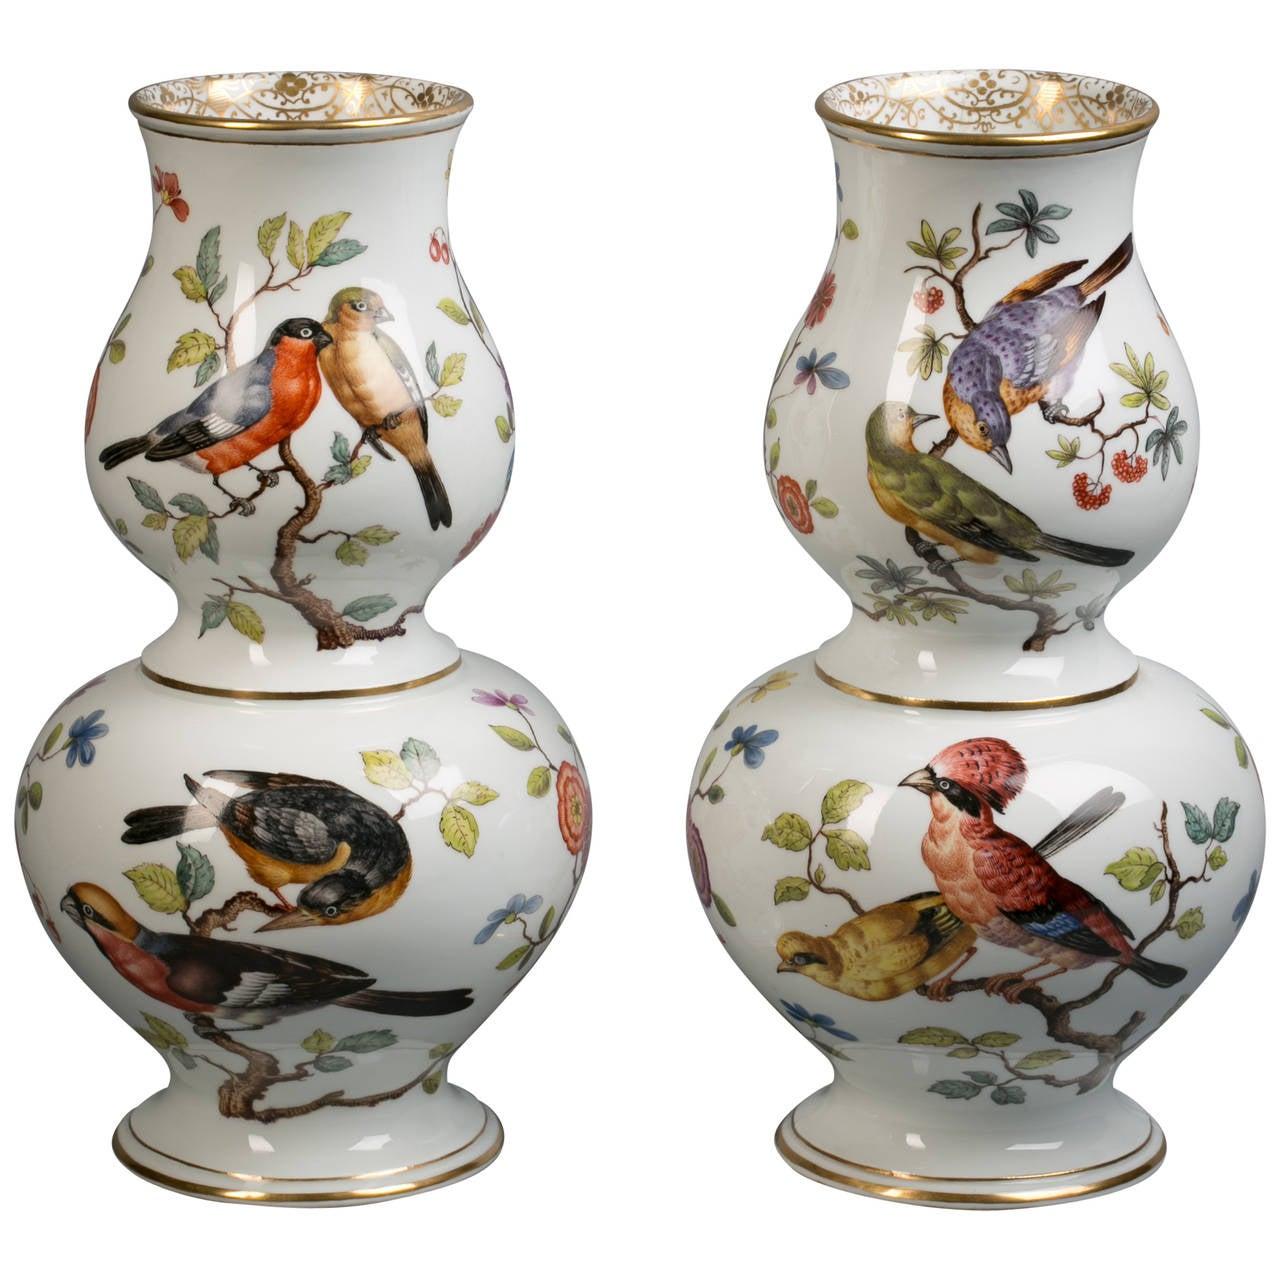 Pair of German Porcelain Double-Gourd Vases, Augustus Rex, circa 1880